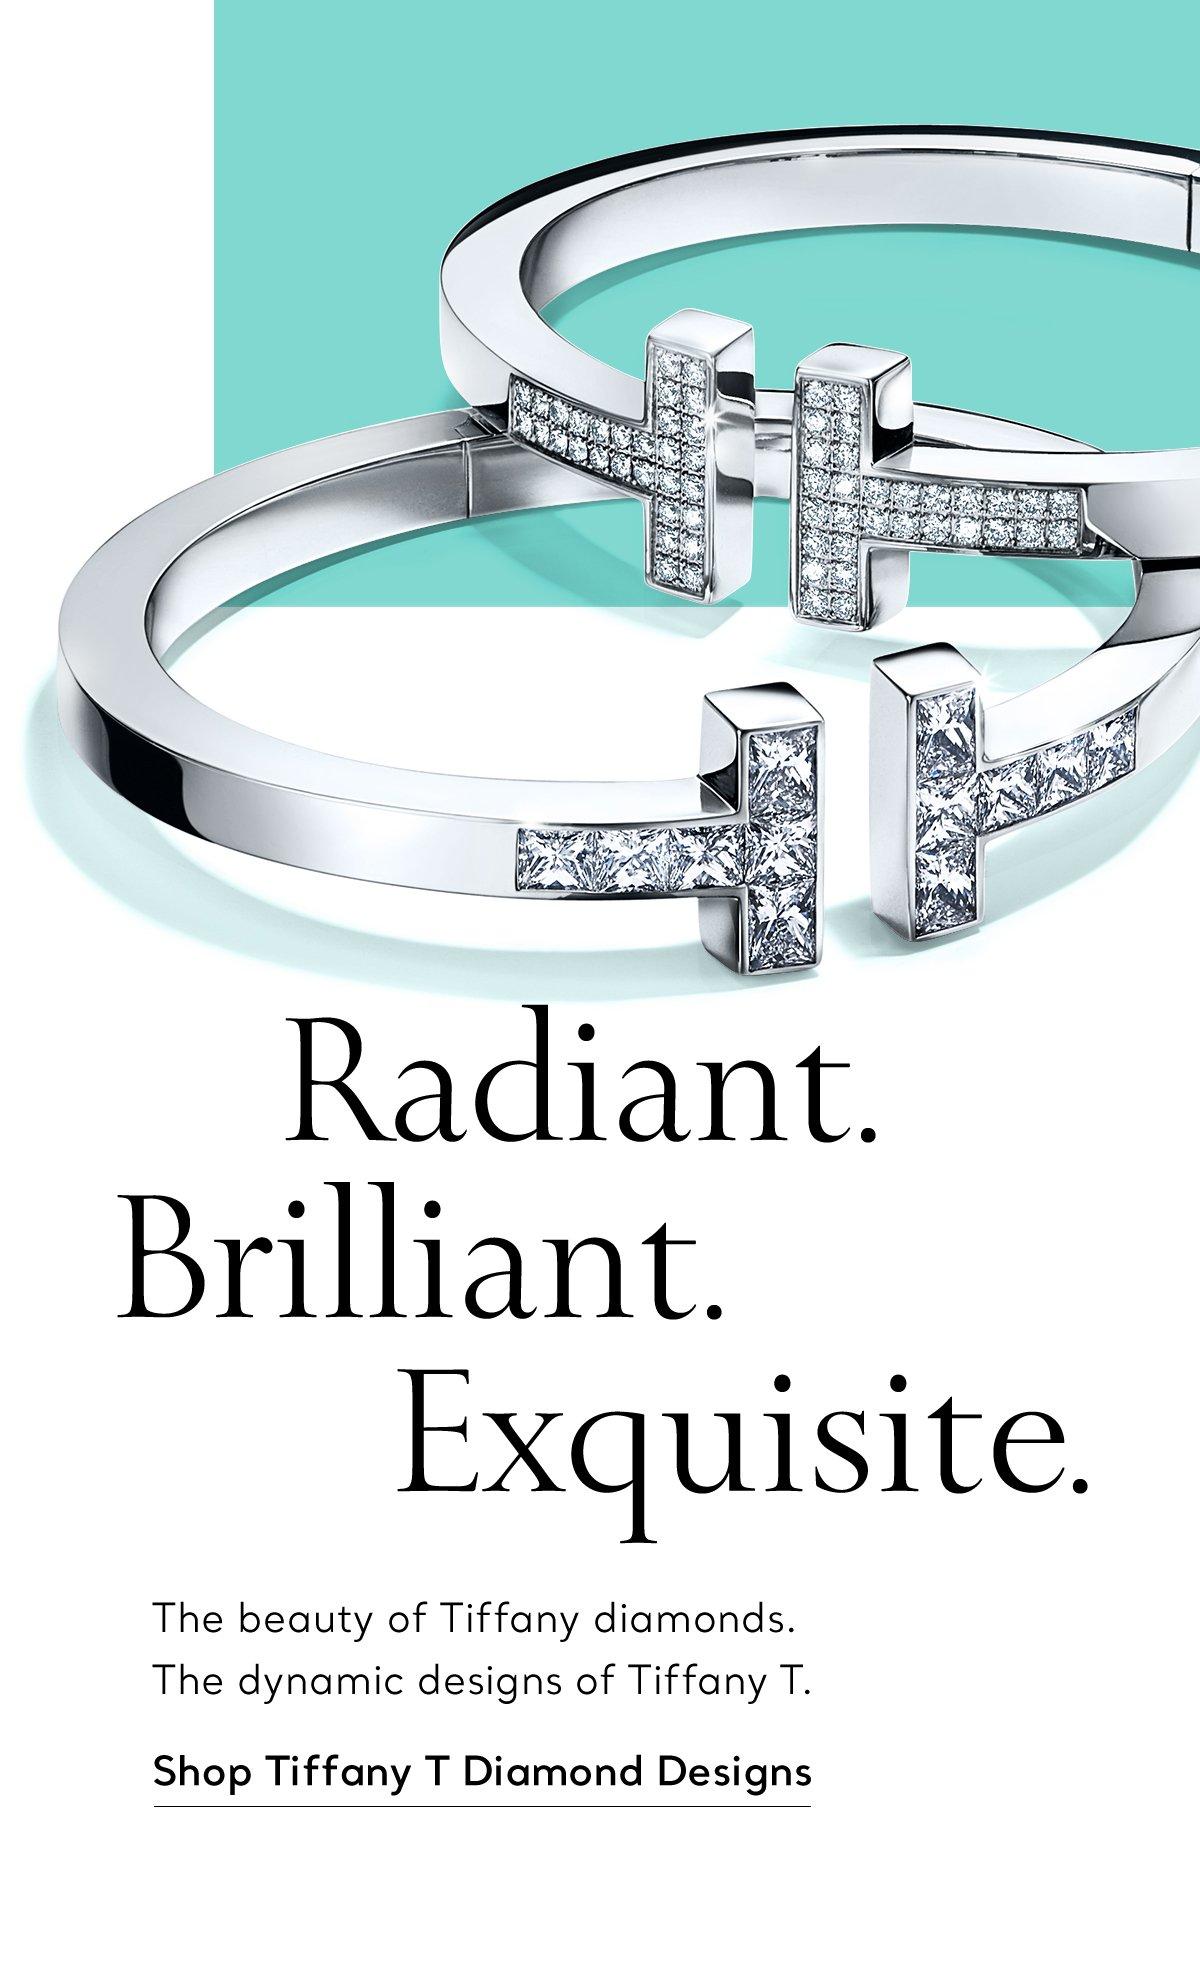 Shop Tiffany T Diamond Designs